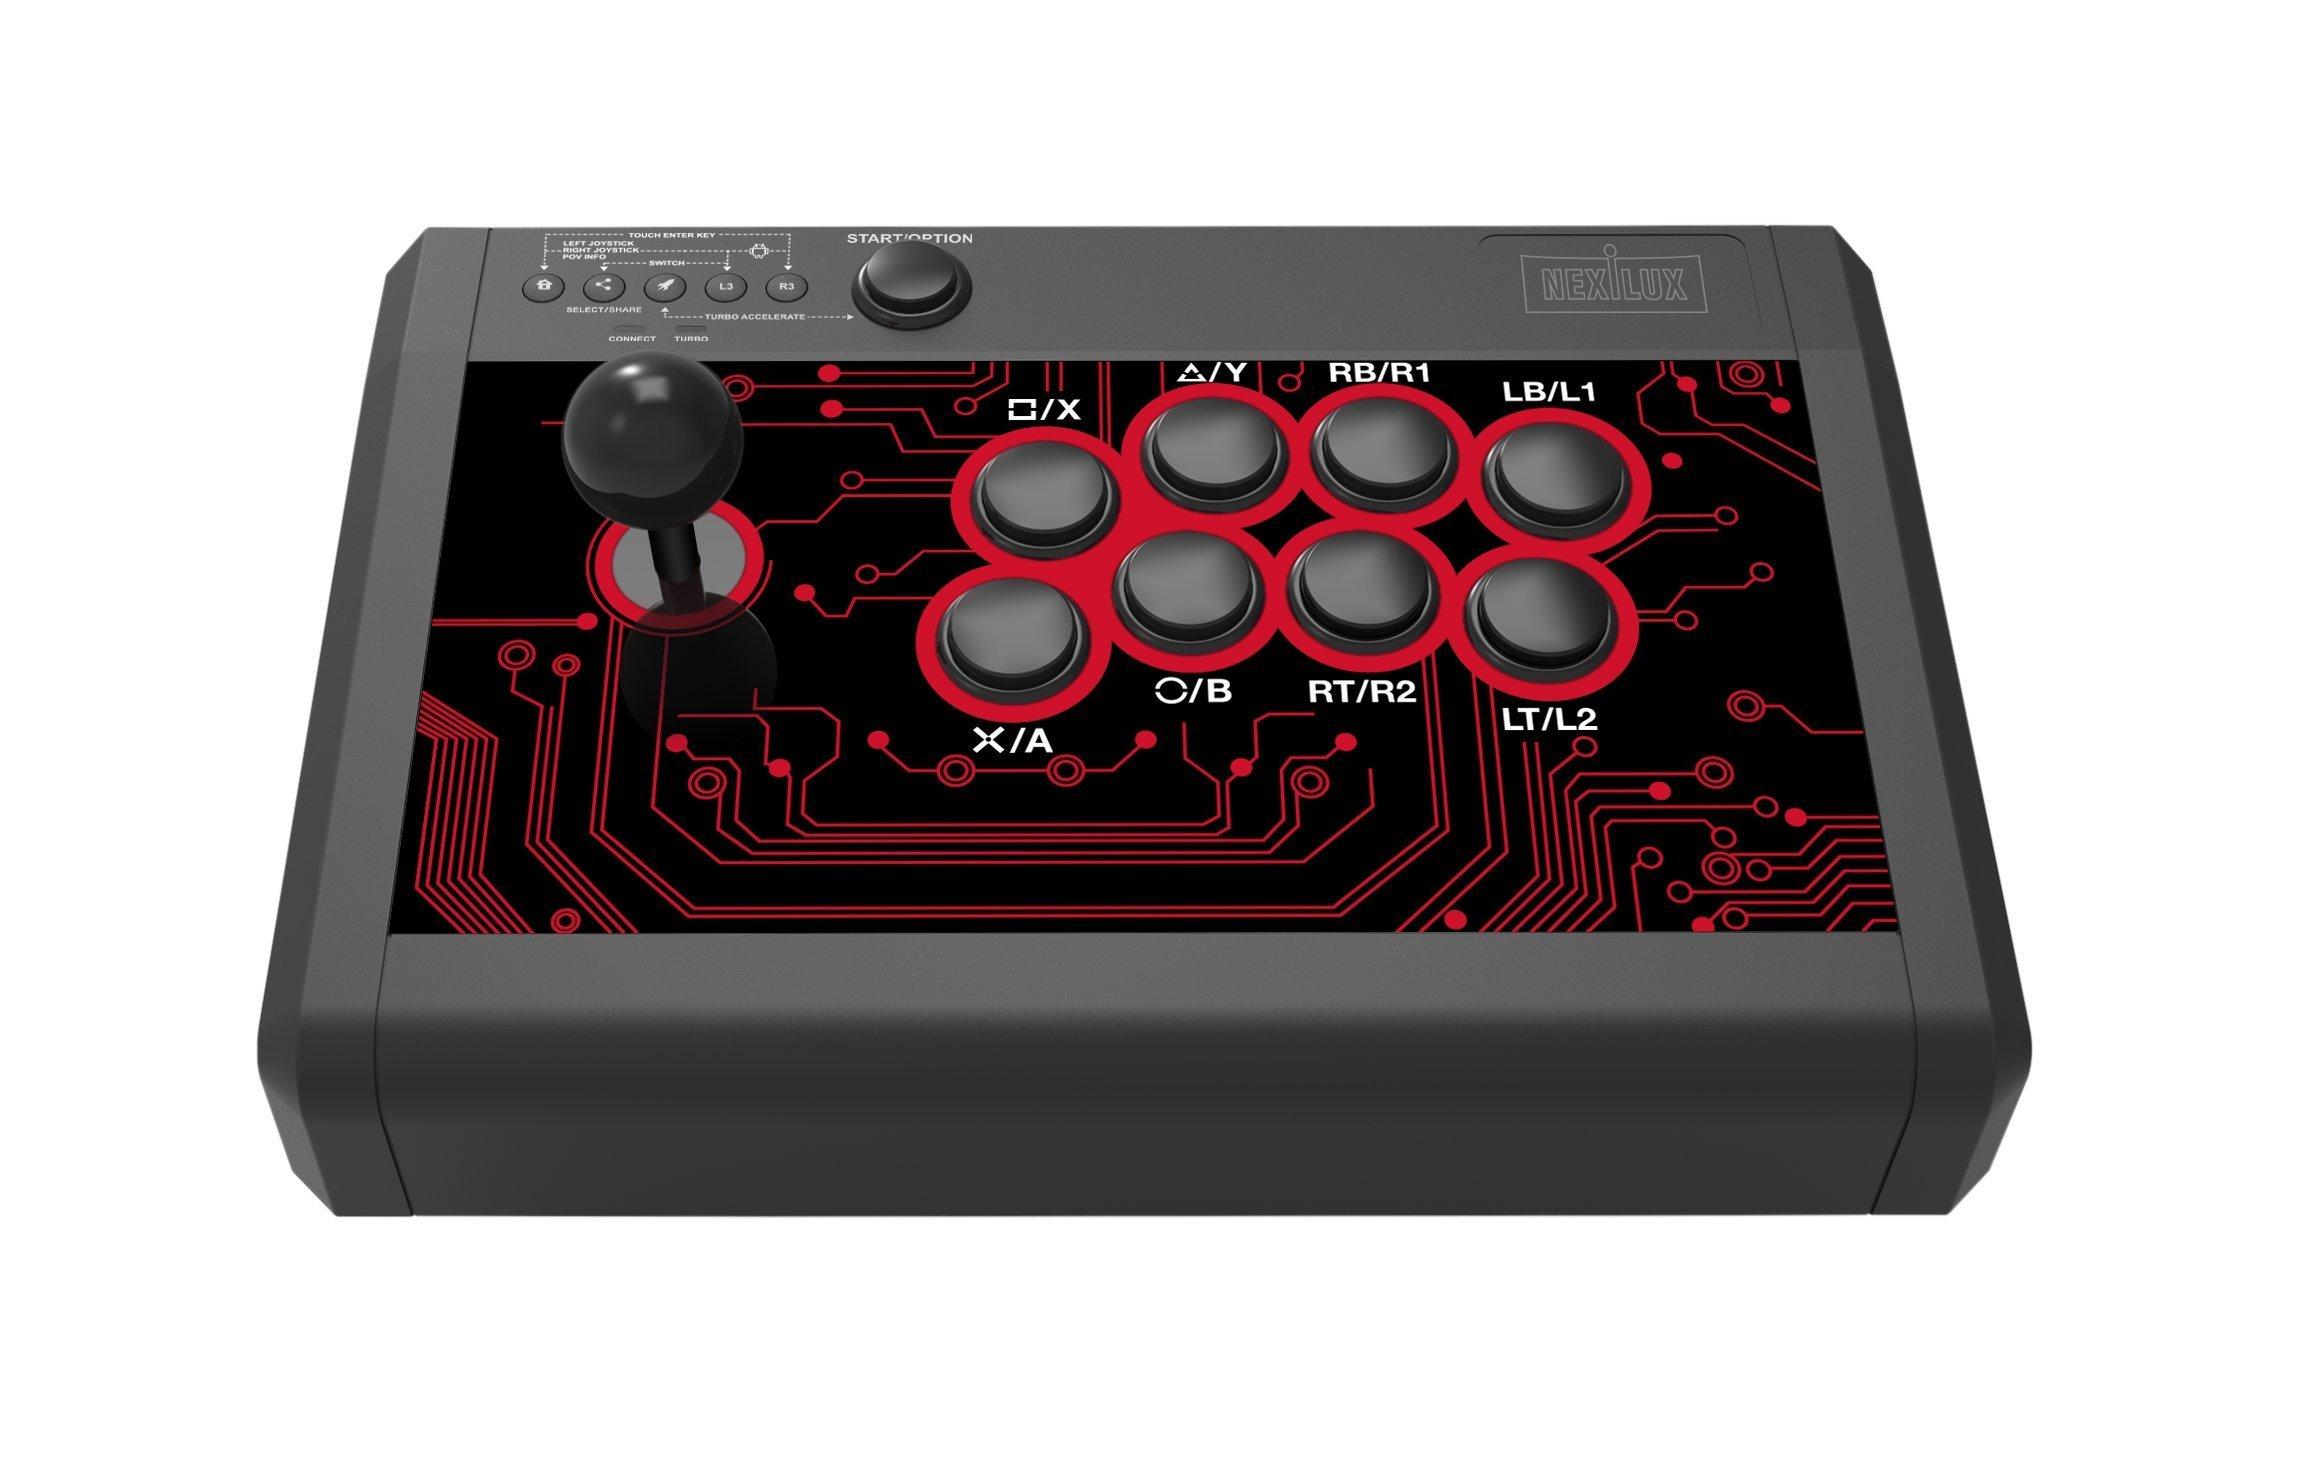 Arcade Fight Stick Palanca de Mando para PS4 PS3 Xbox One 360 PC Android & Switch: Amazon.es: Electrónica